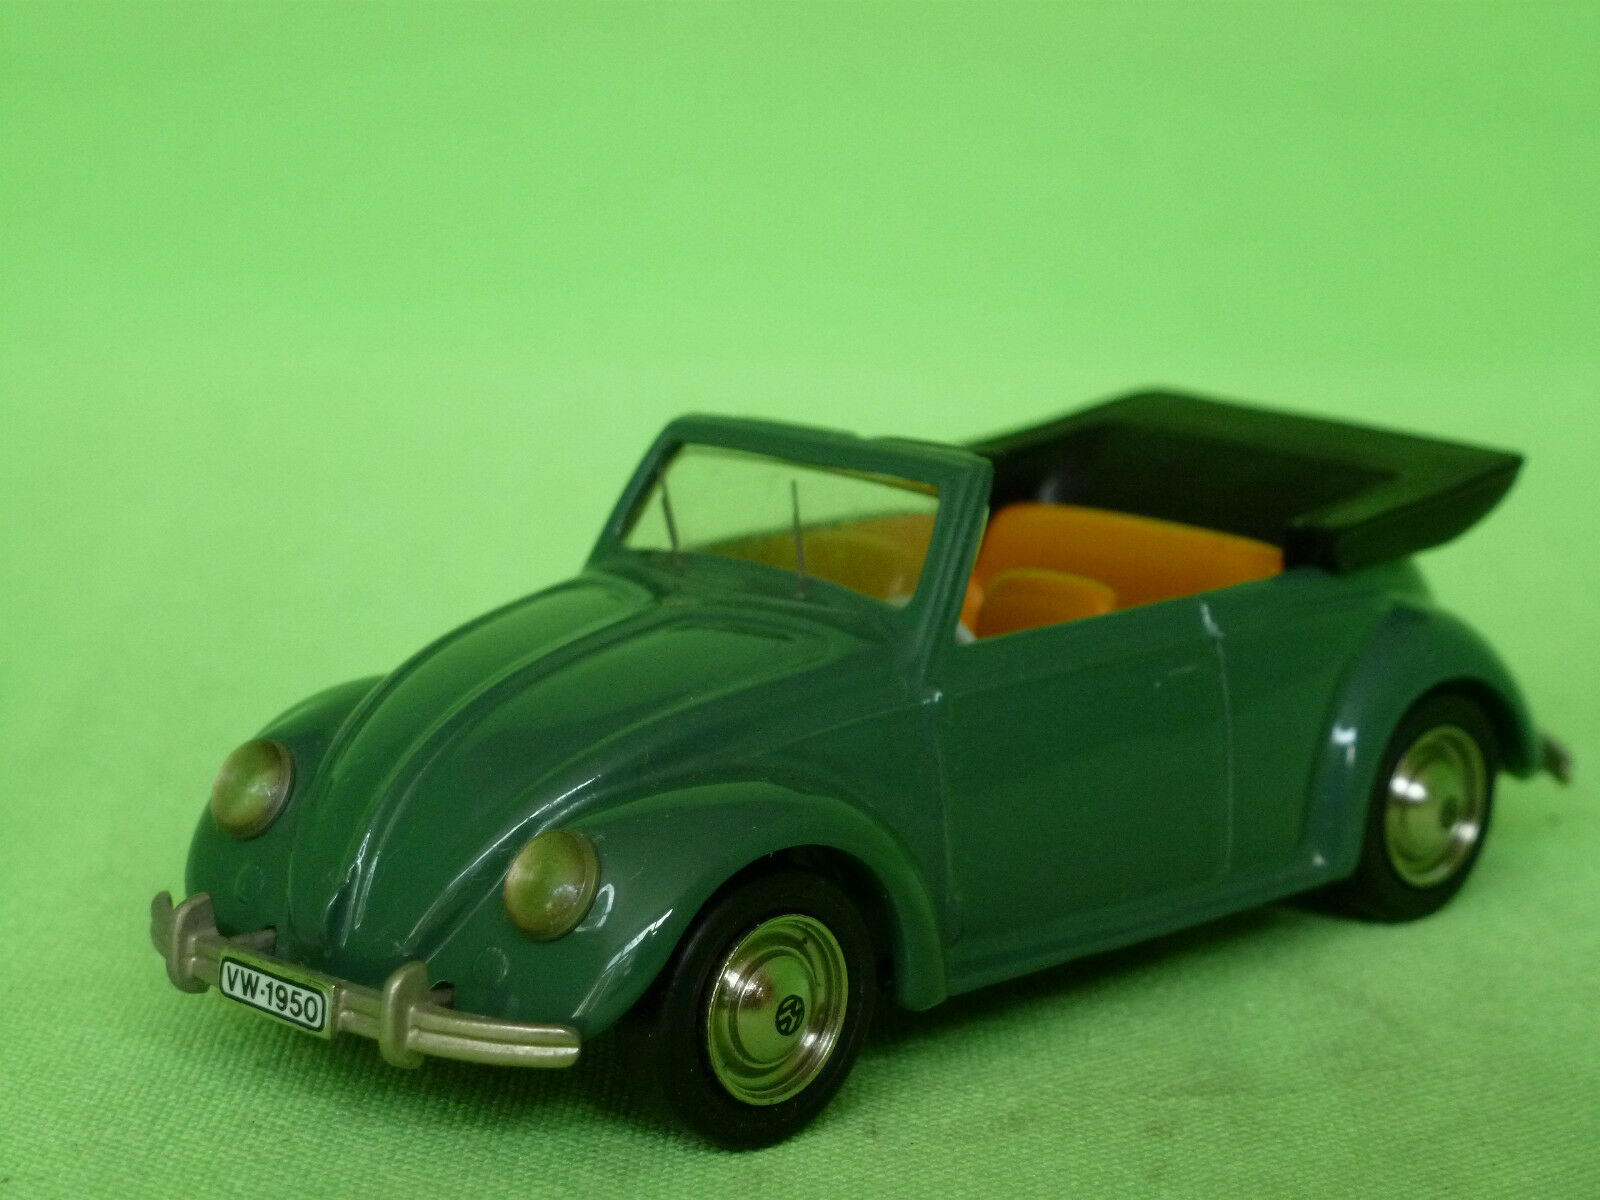 CENTURY 15  VW VOLKSWAGEN 120 CABRIOLET 1950 CONVERTIBLE  NEAR MINT CONDITION